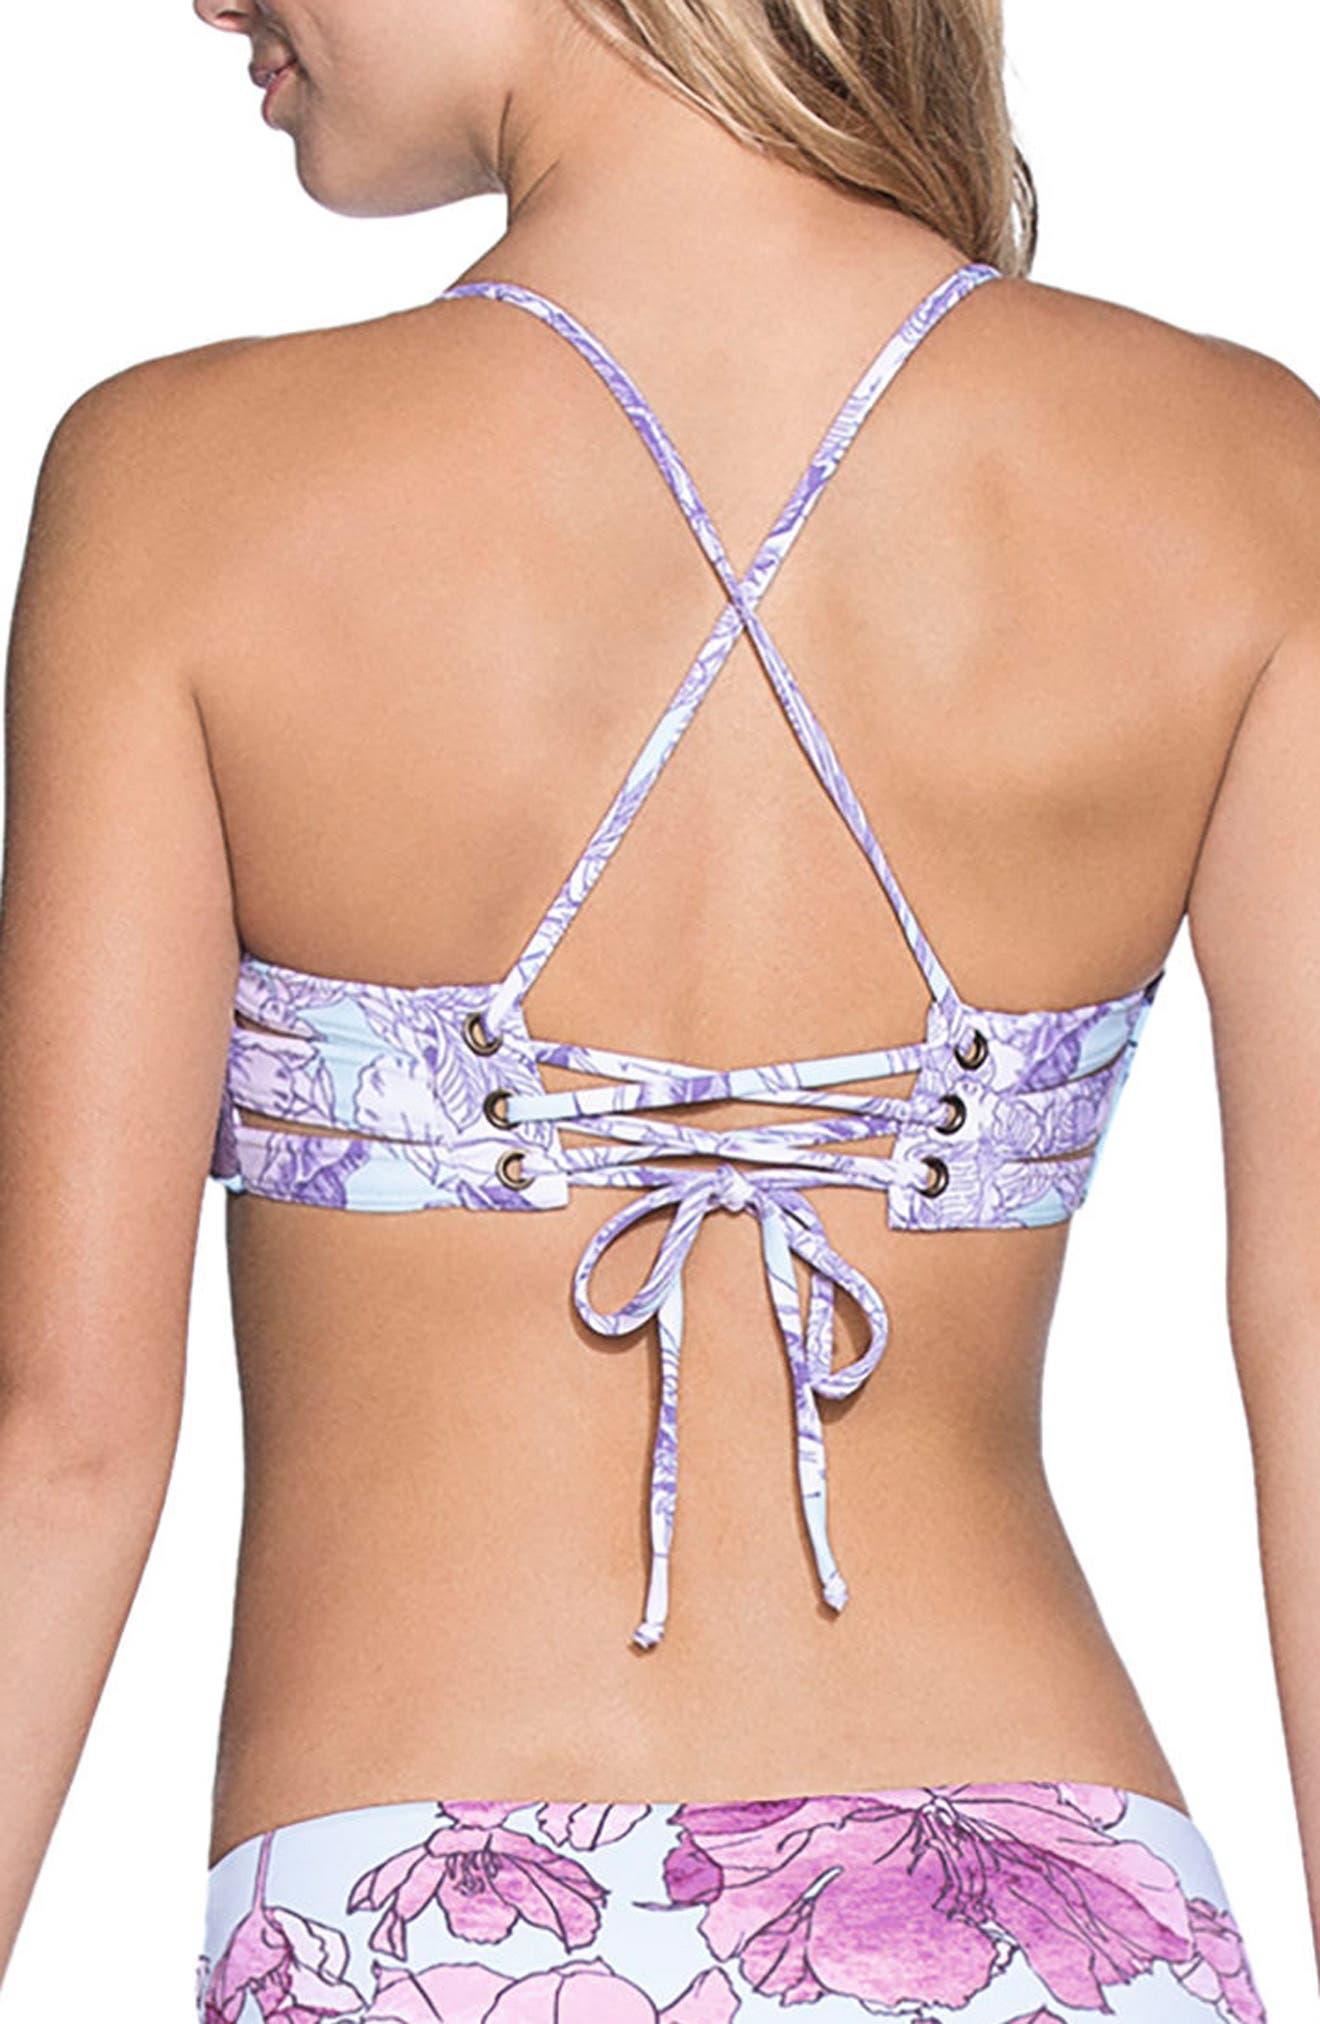 South Pacific Bikini Top,                             Alternate thumbnail 2, color,                             Purple Multi